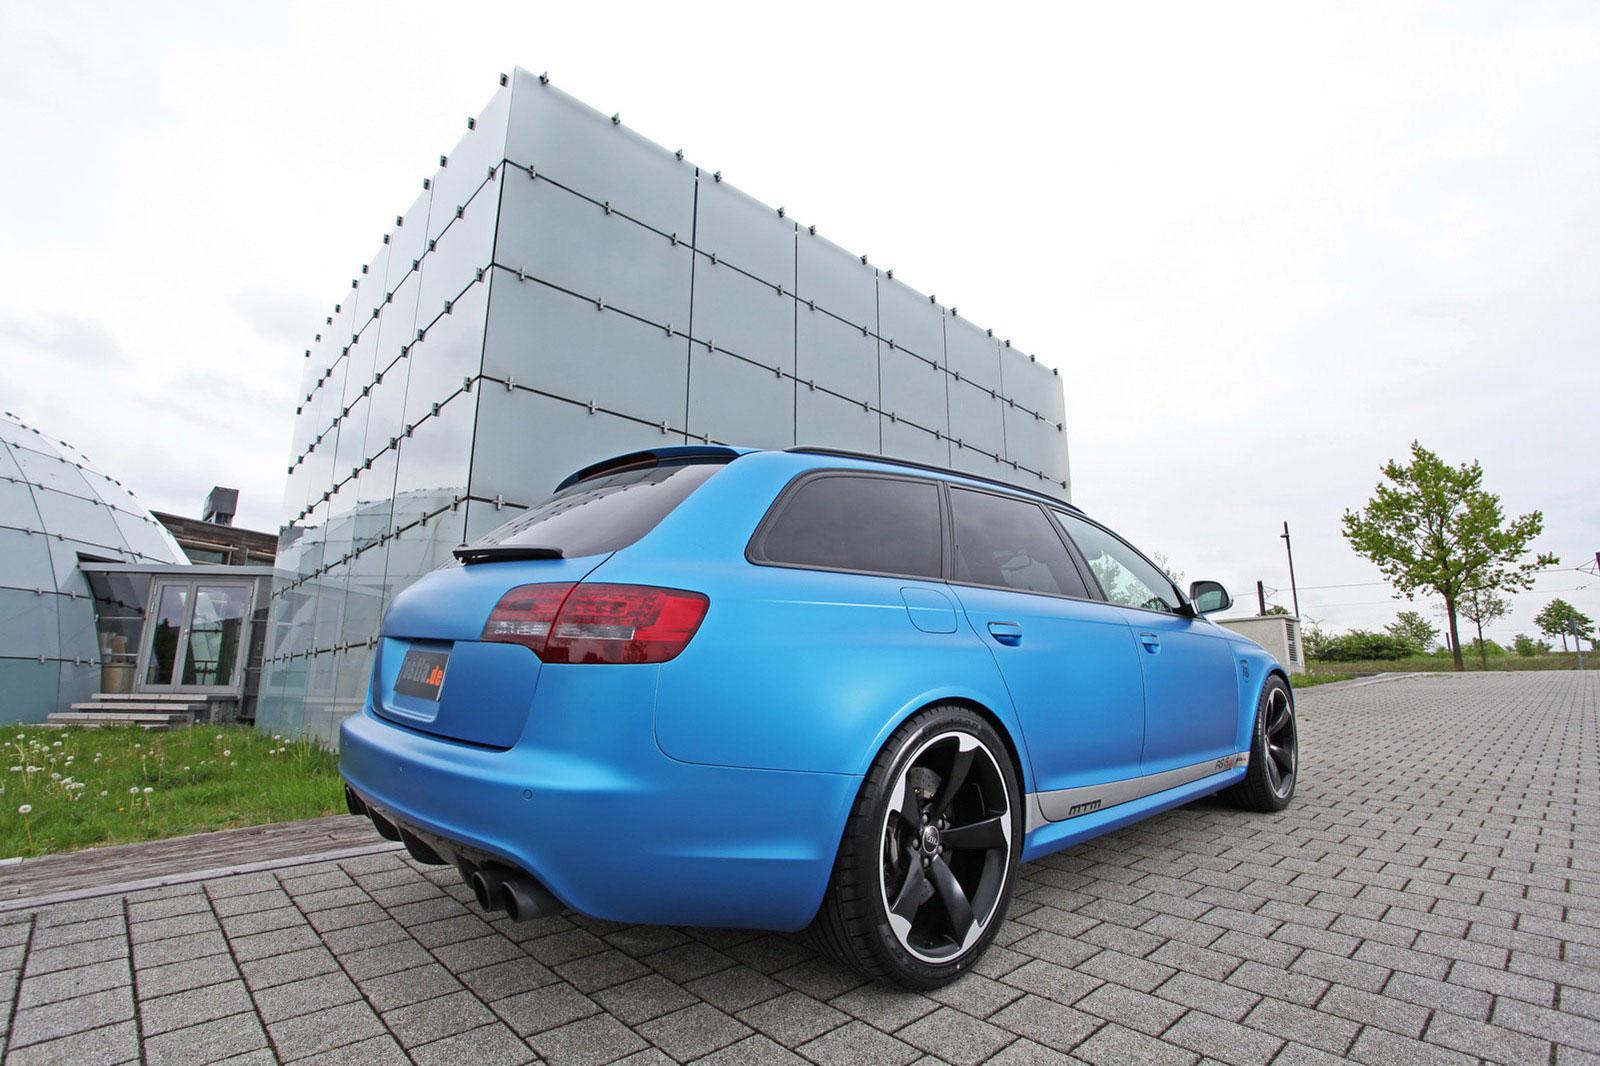 Fostla a MTM vytvořili velmi našlapané Audi RS6 Avant 7